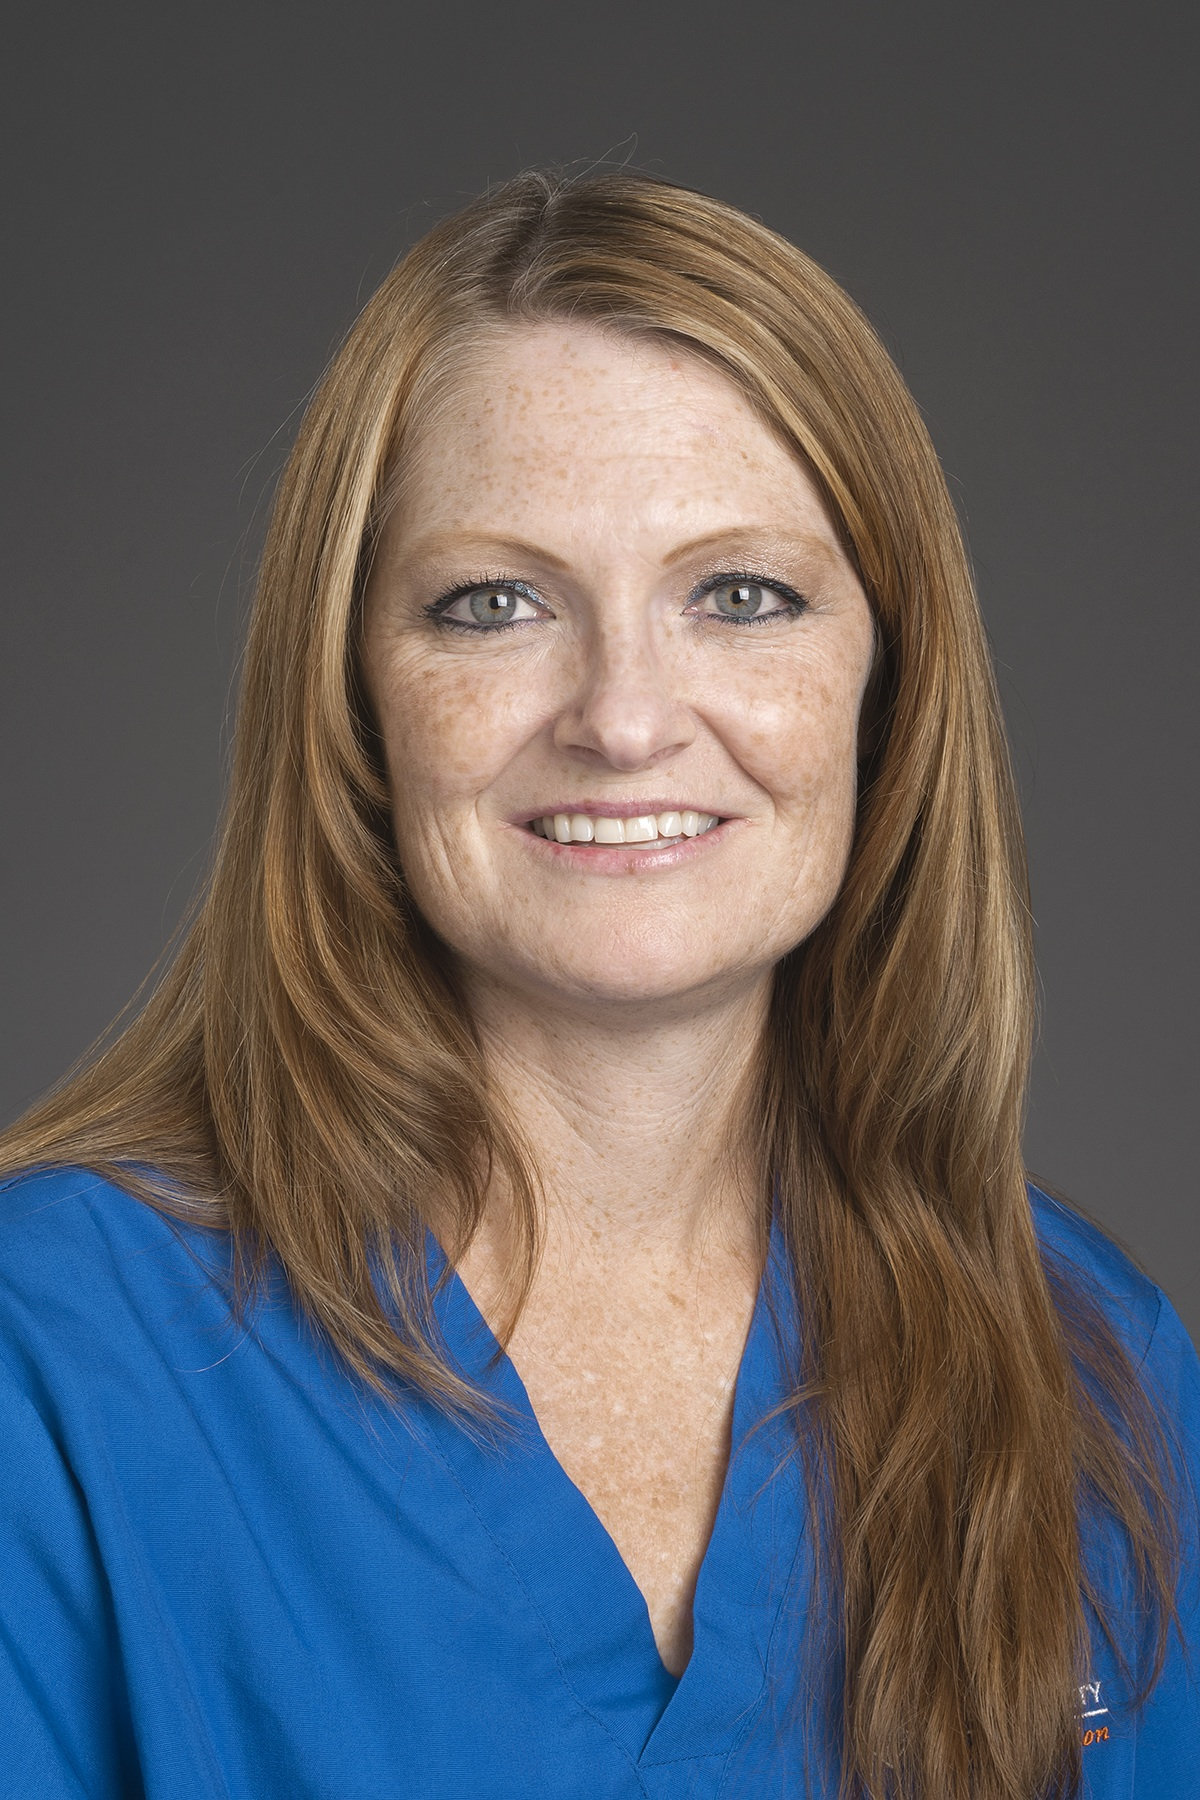 Jennifer Schmaltz portrait